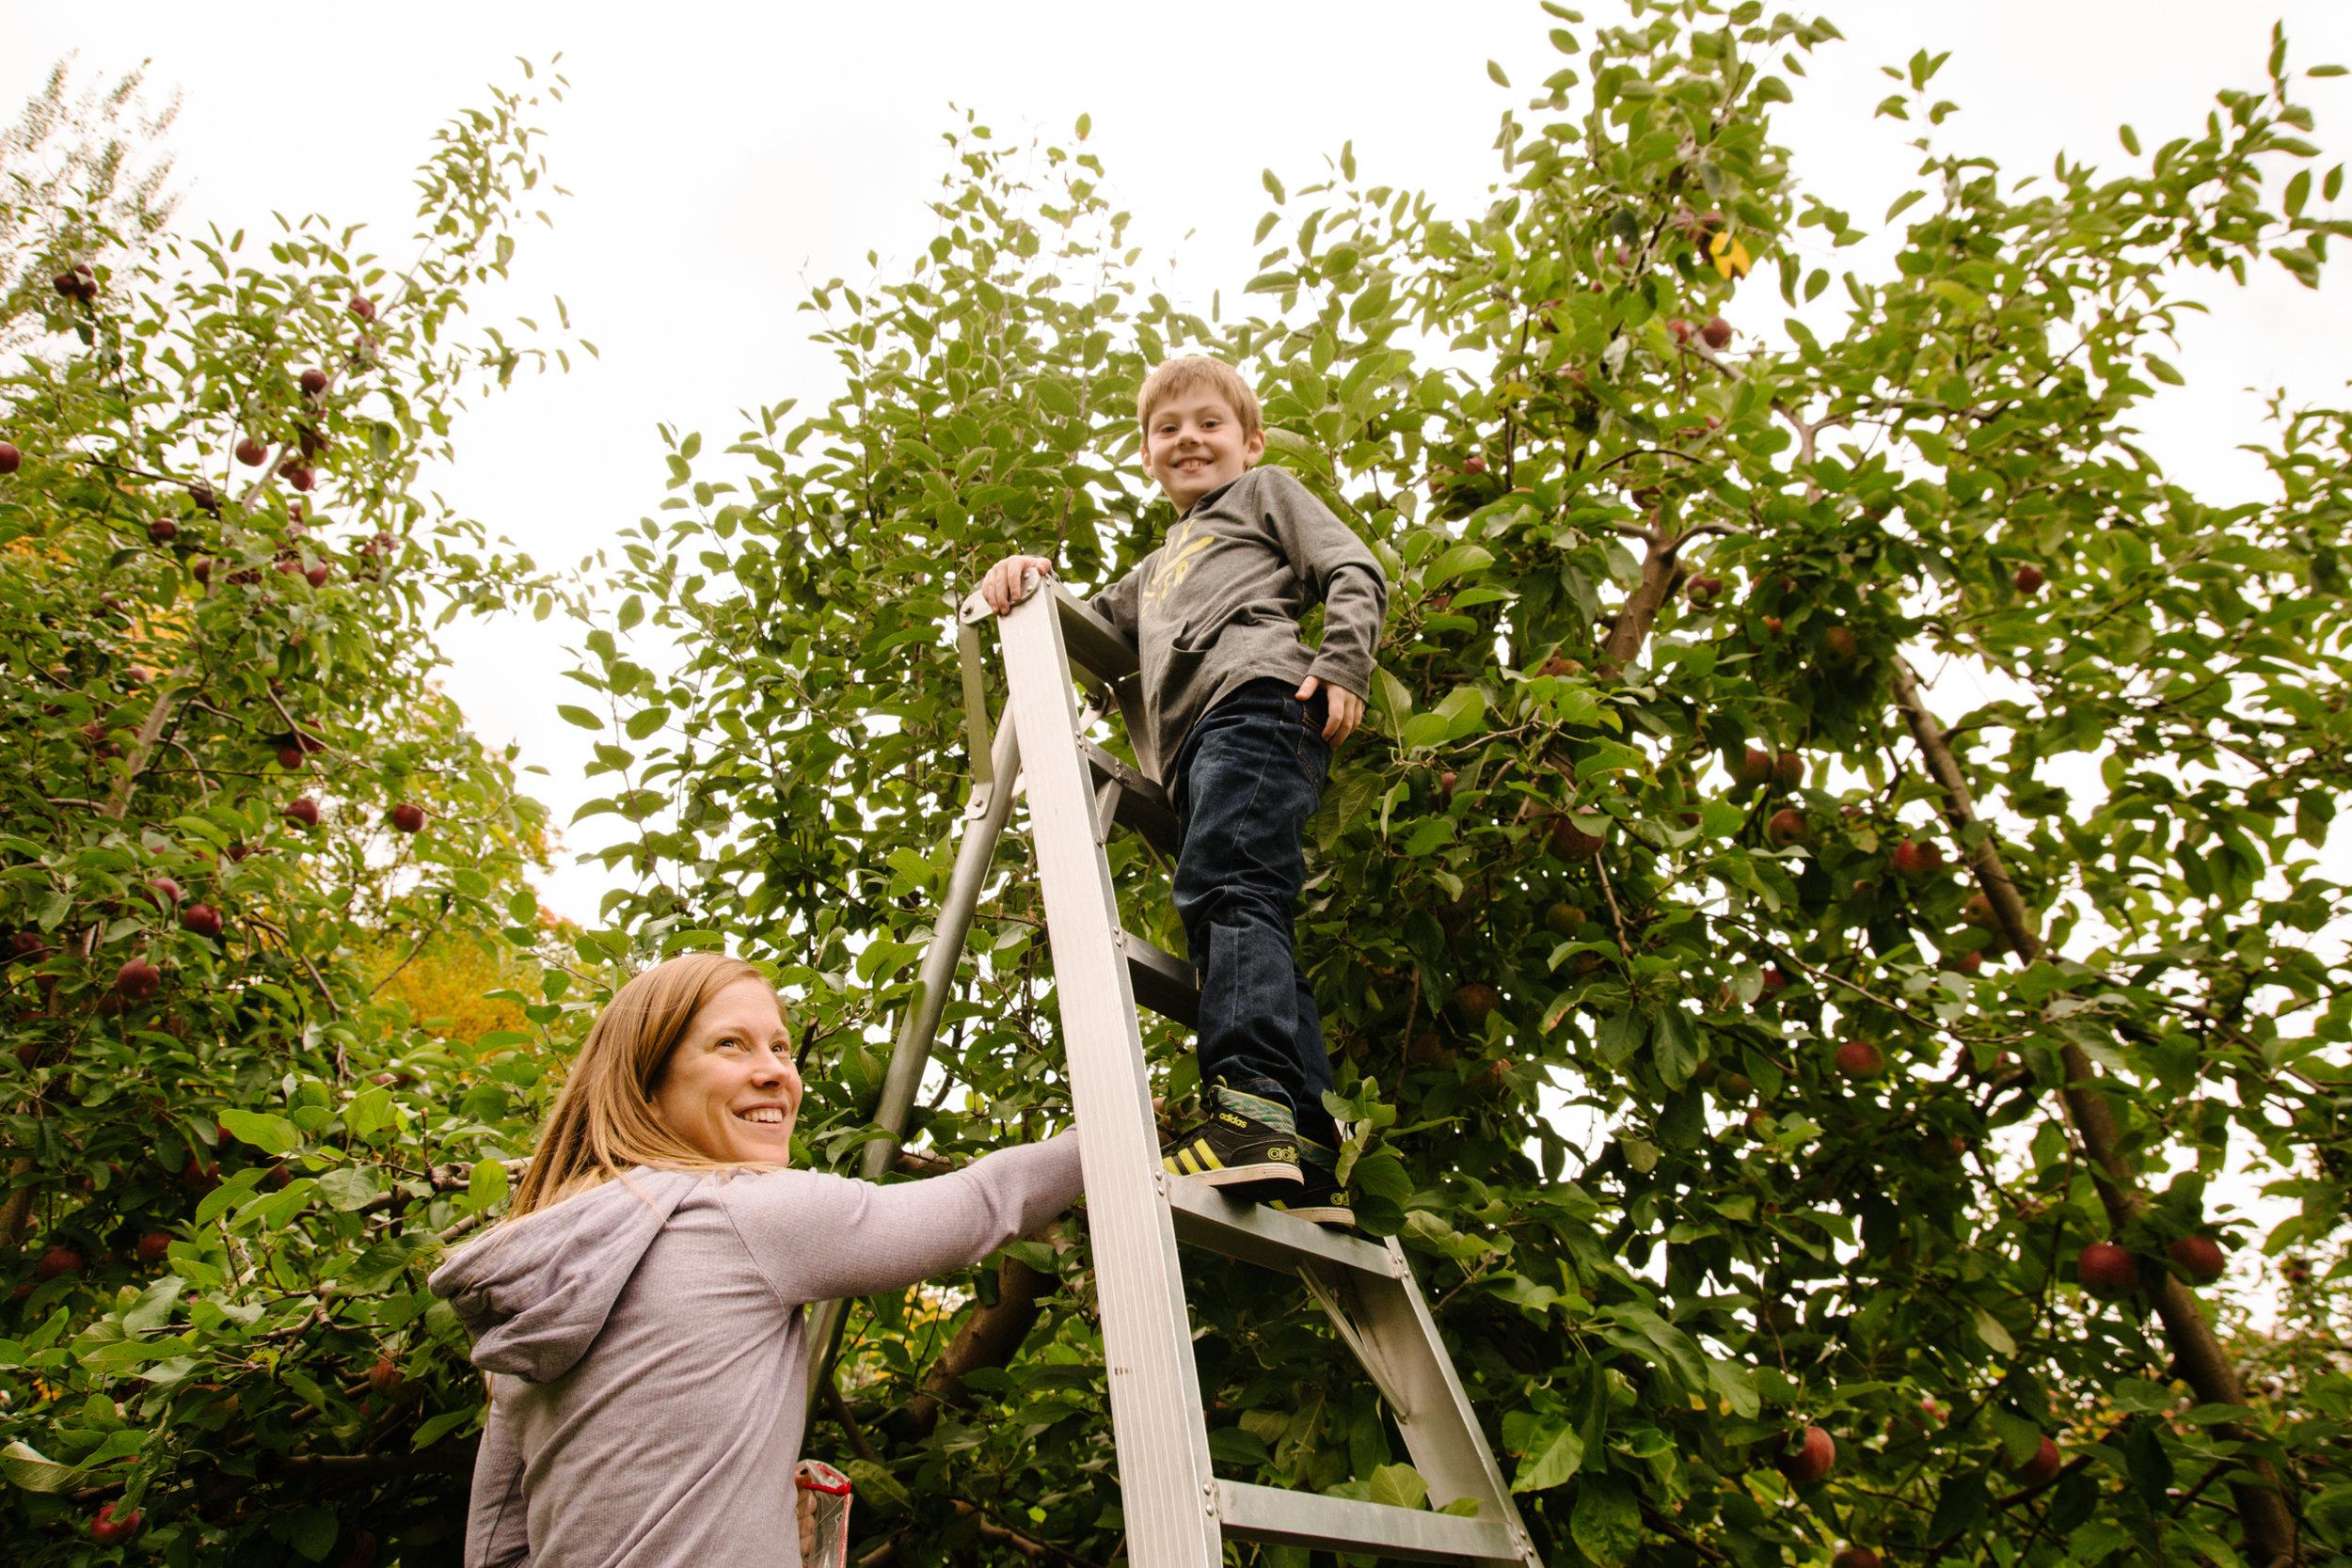 mini-seance-aux-pommes-verger-des-bois-francs-plessisville-photographe-famille-victoriaville-montreal-3.jpg